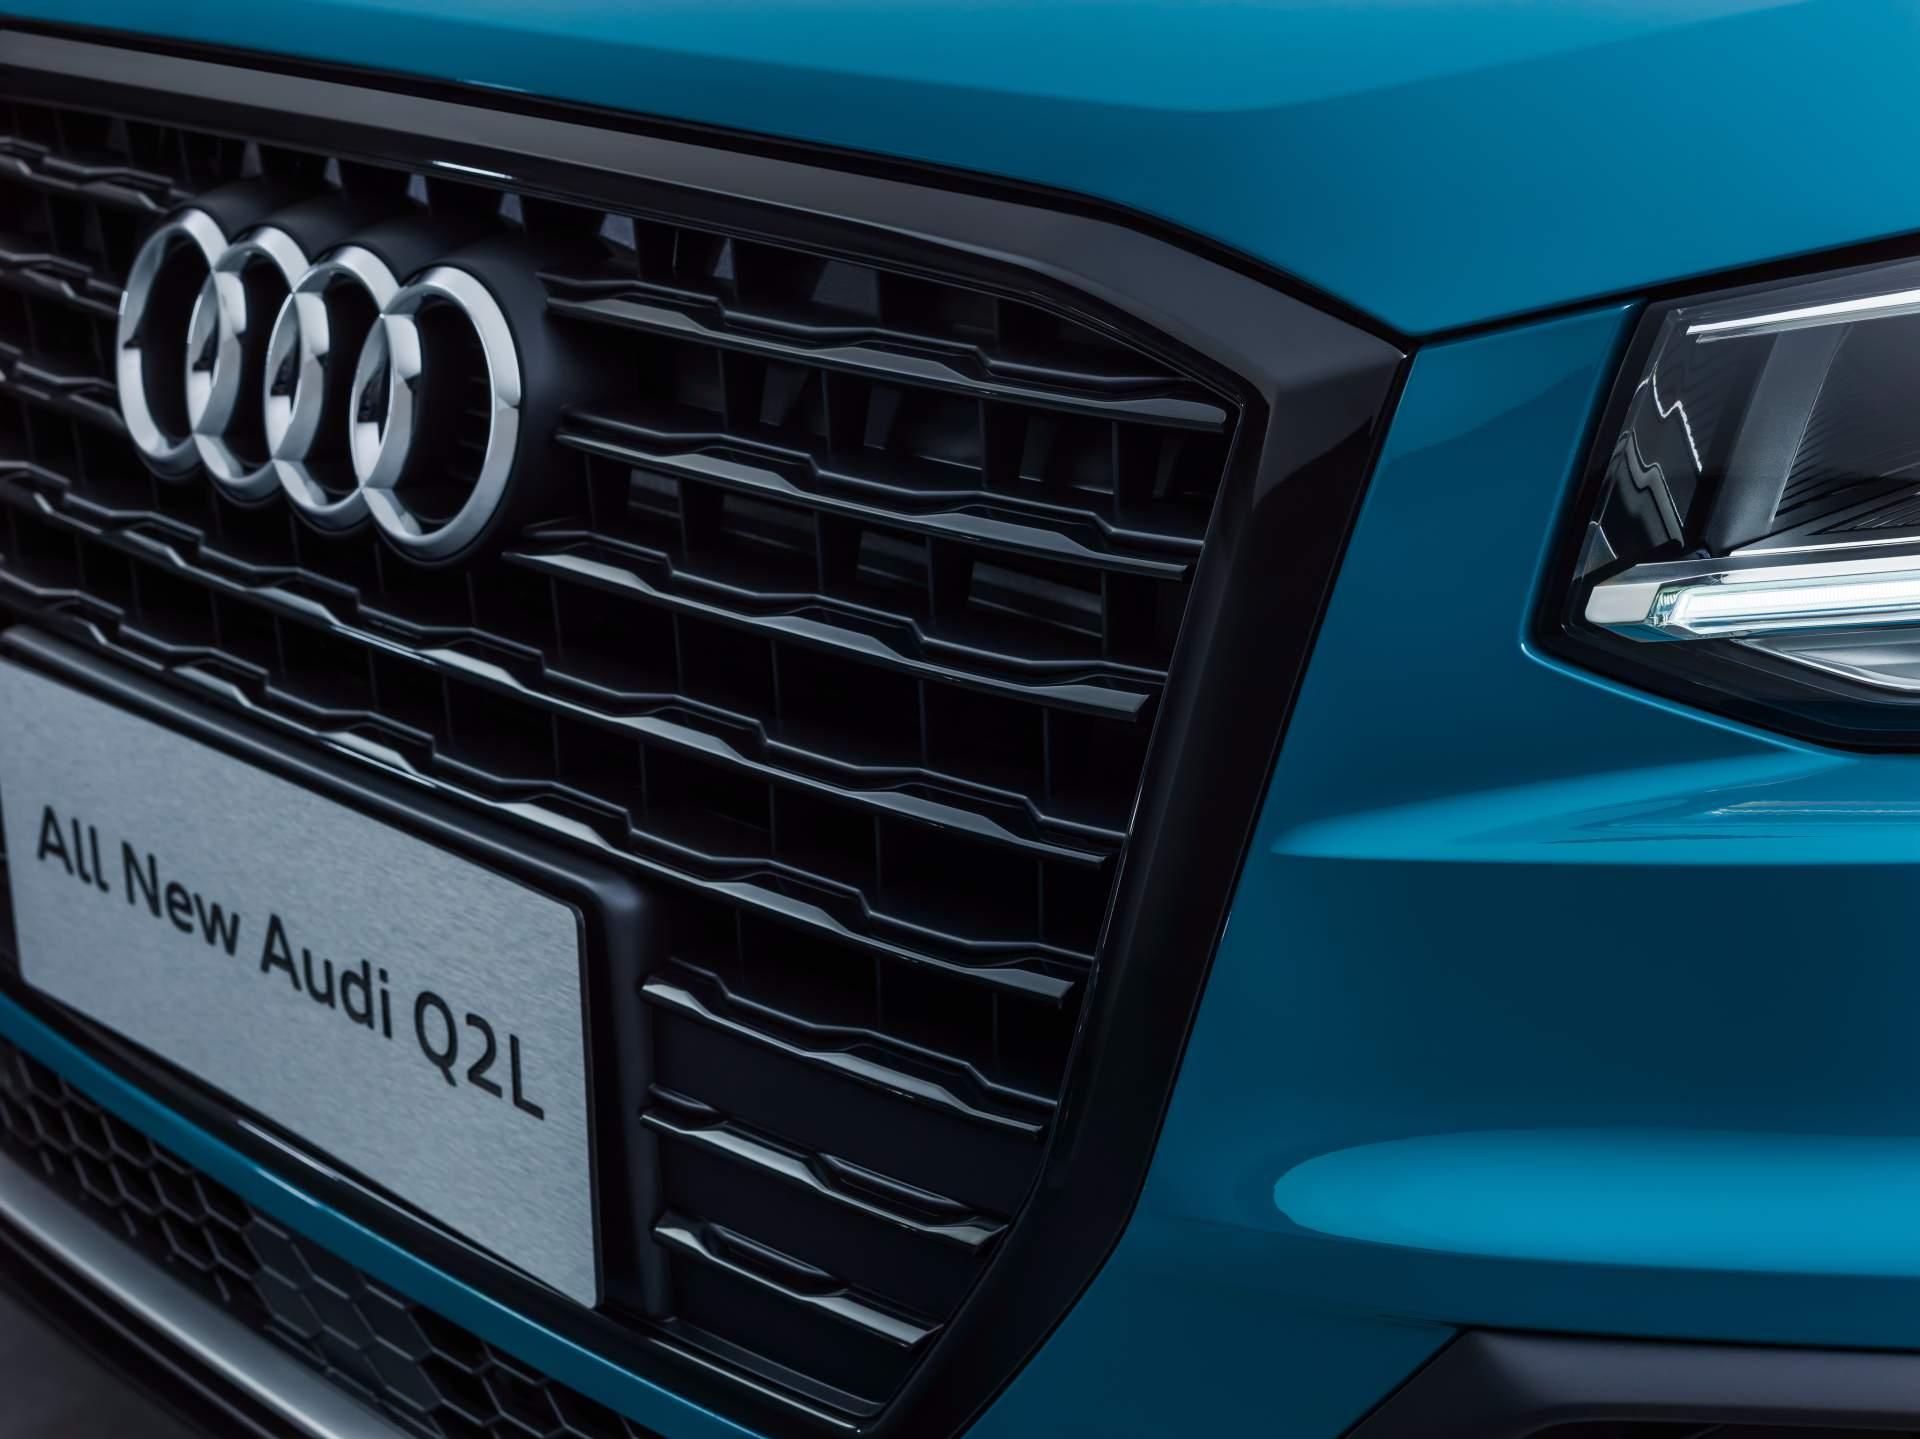 Audi_Q2_L_0041